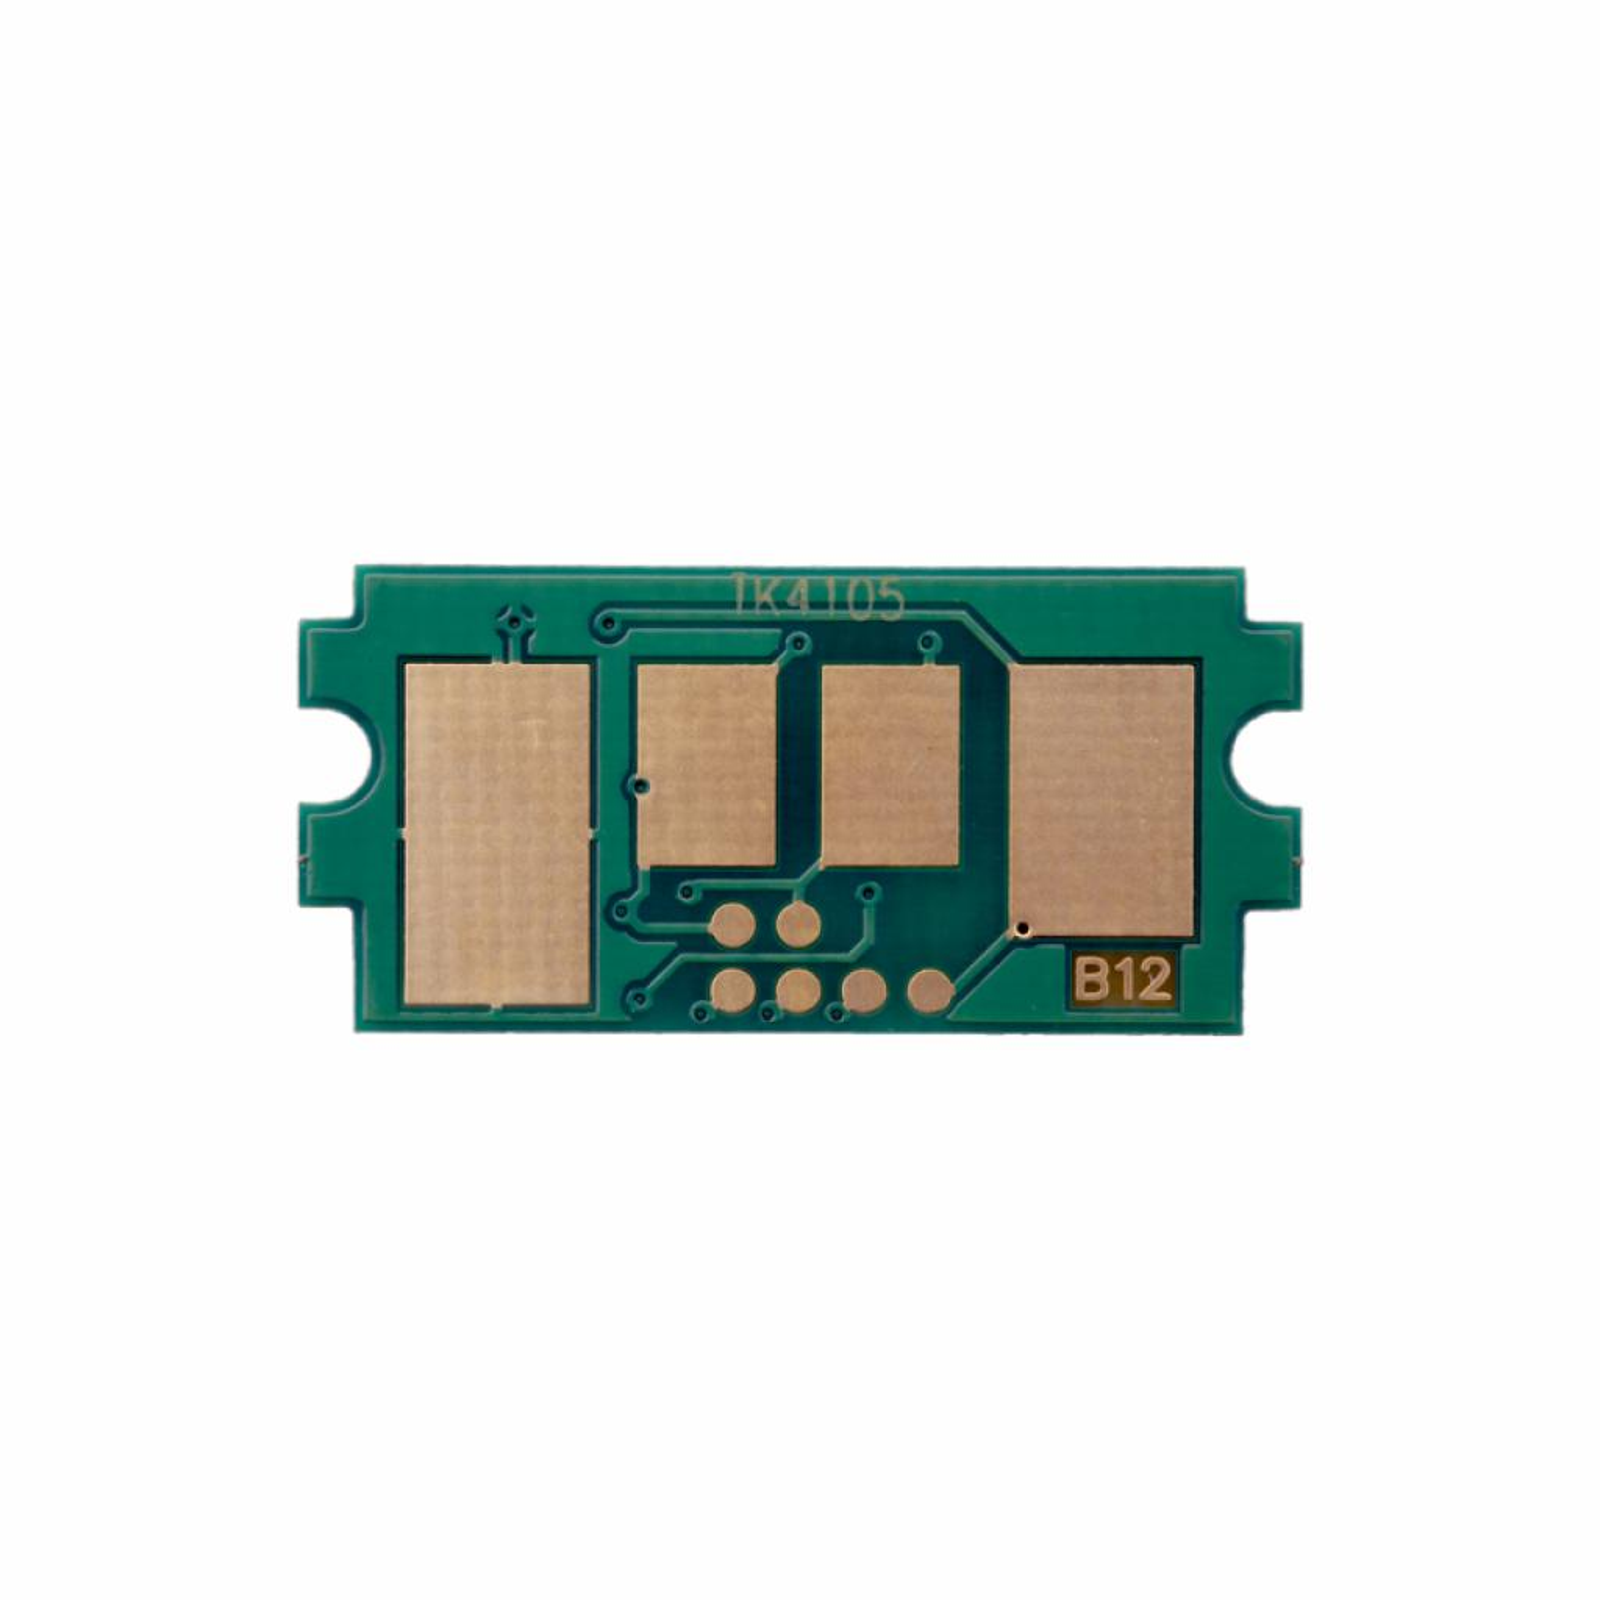 Чип для картриджа Kyocera TK-3100 (EU/MEA) 22.2k (MPS) Static Control (MPSTK3100CP-EU)